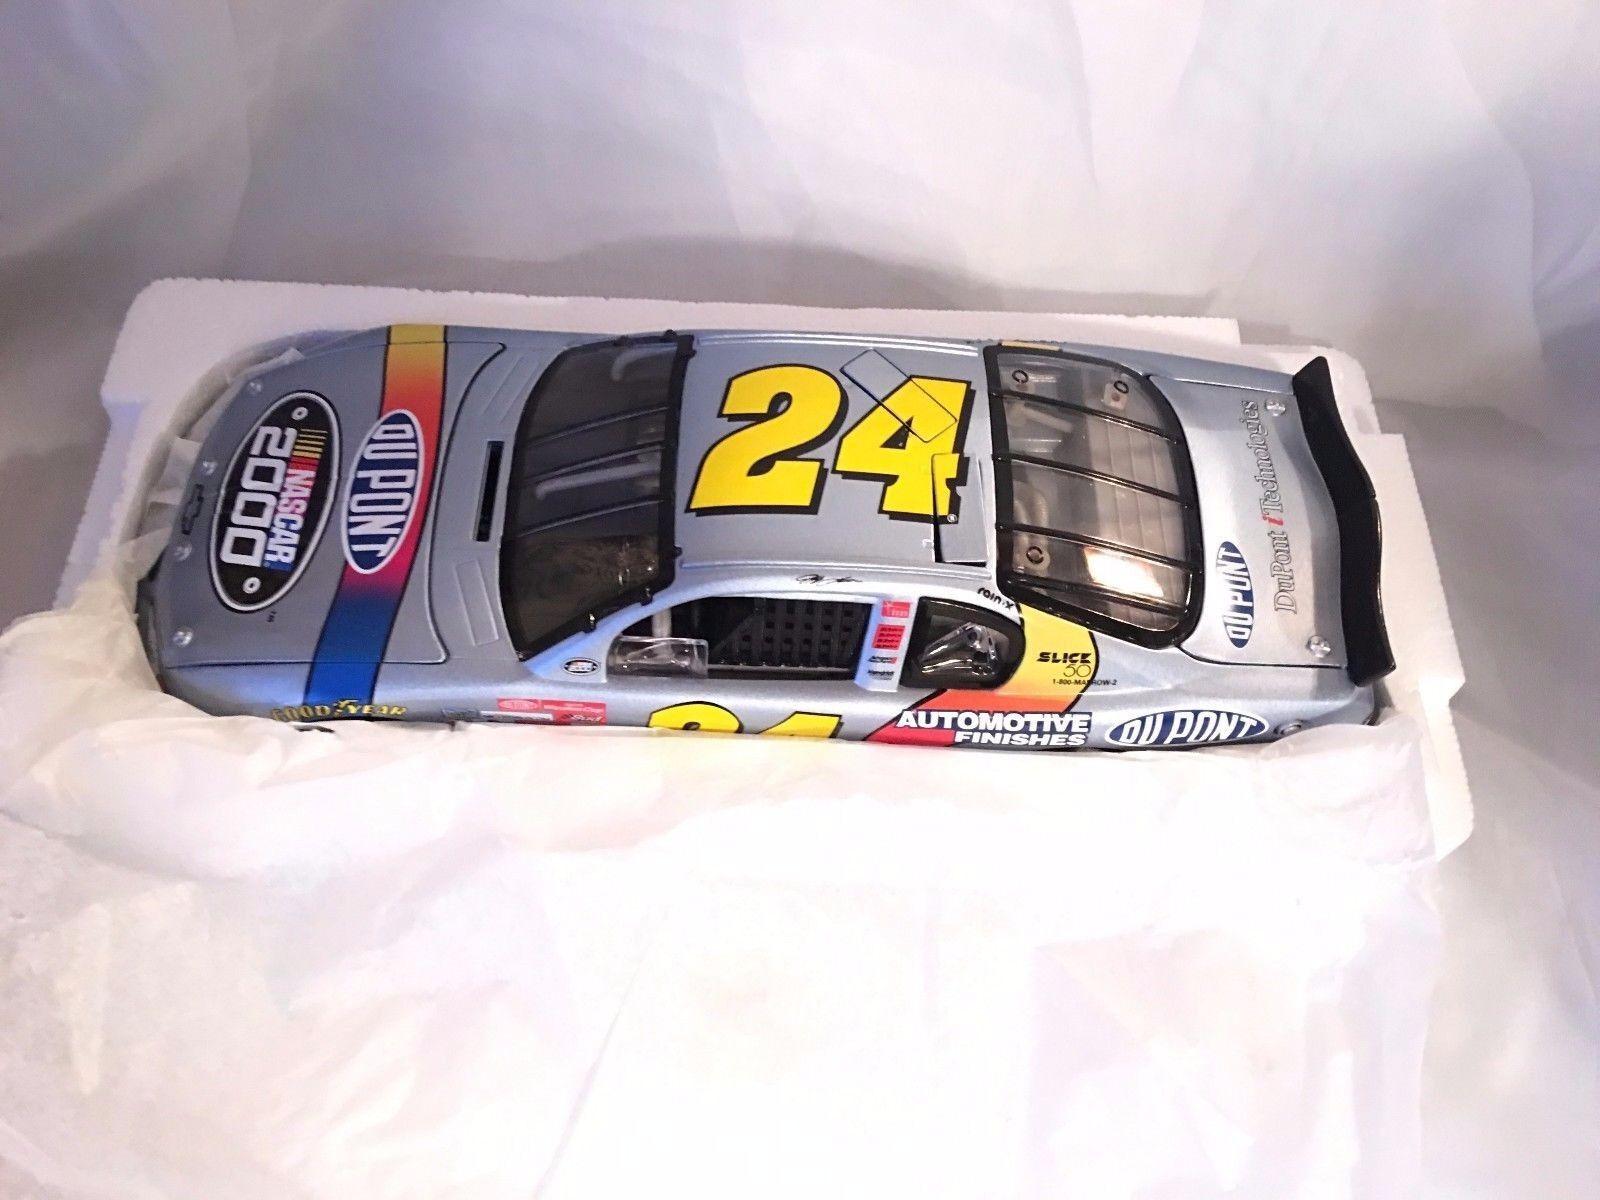 JEFF GORDON DUPONT NASCAR 2000  MONTE CARLO 1 18 18 18 'NEW'SEALED'MINT'CLASSIC 35fc39